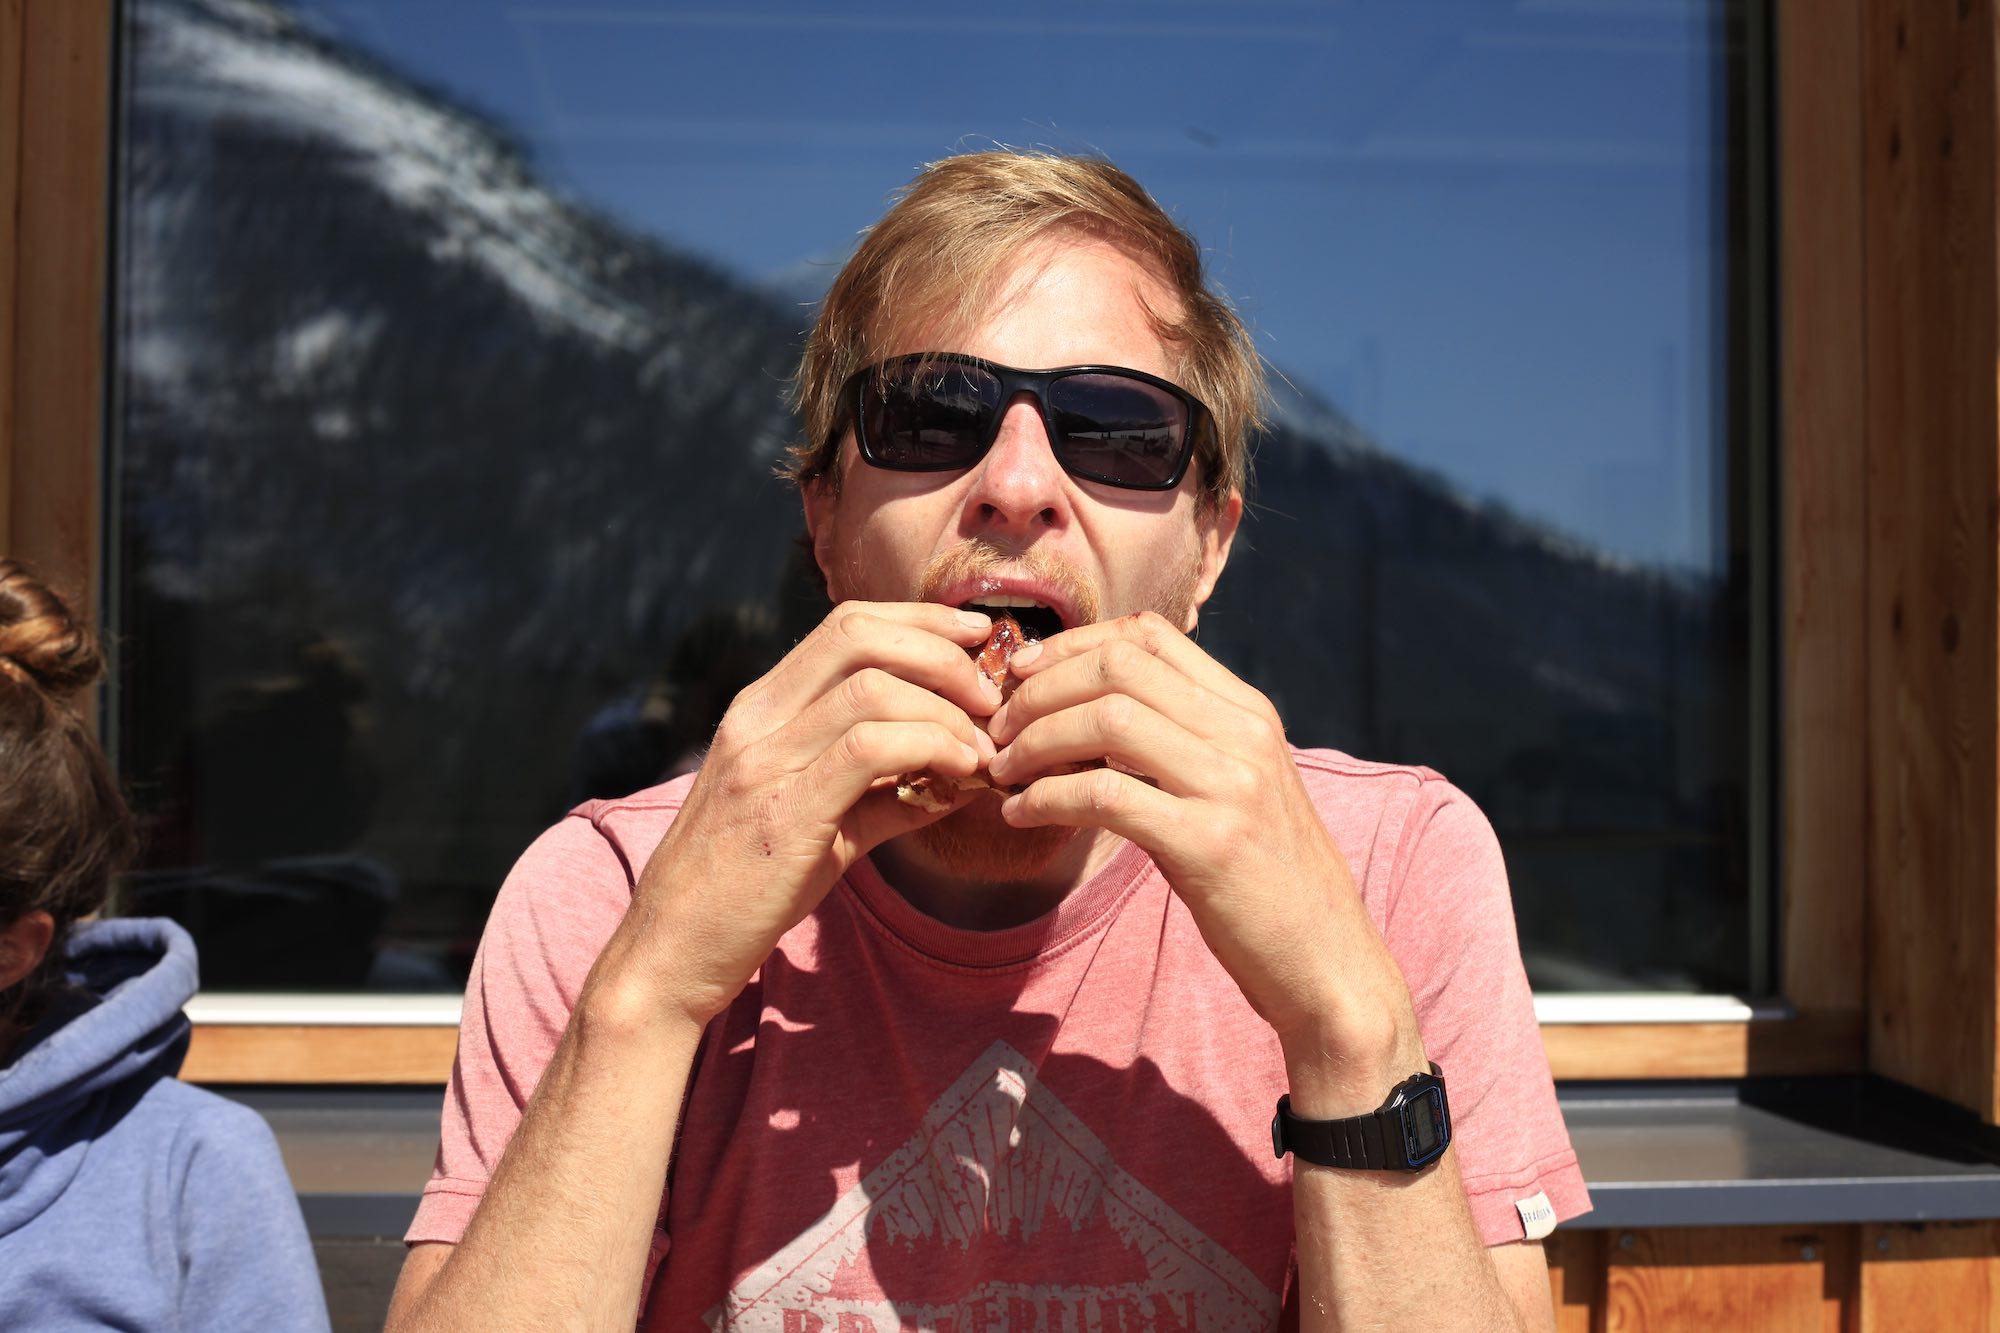 Vegan BBQ in Austria at MoaAlm Mountain Retreat